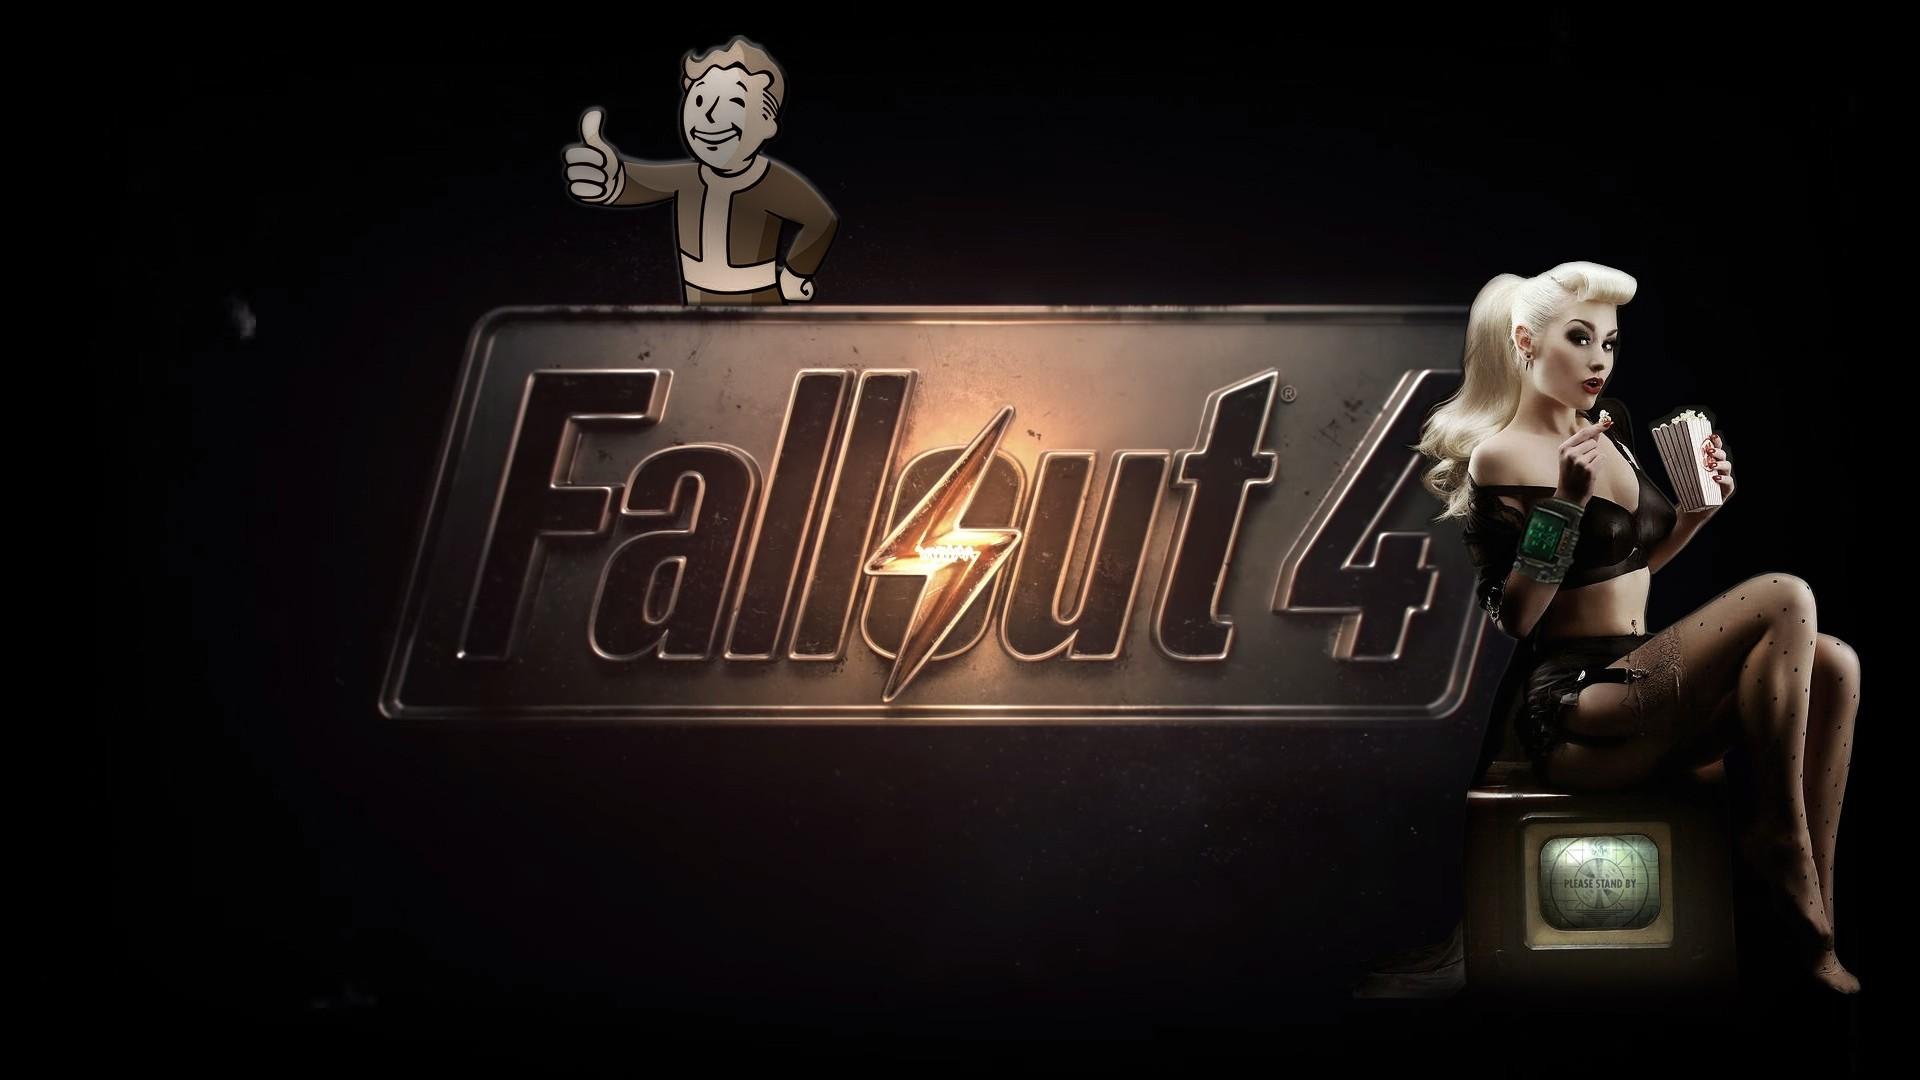 Great Wallpaper Logo Fallout 4 - 171055-fallout-4-hd-wallpaper-1920x1080-samsung  2018_712215.jpg